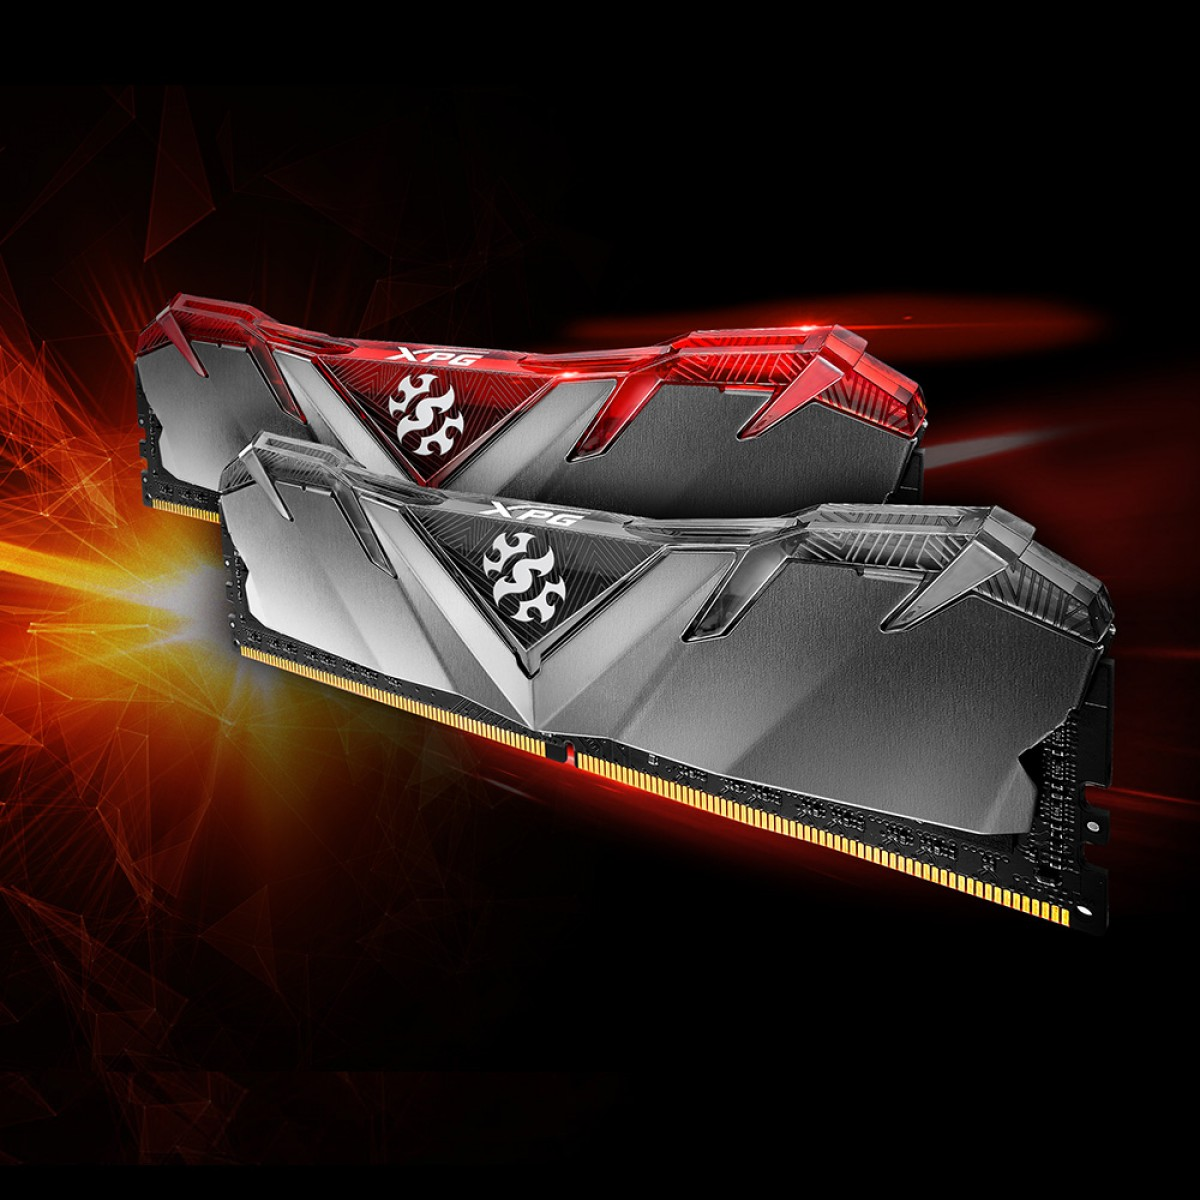 Memória DDR4 XPG Gammix D30, 8GB, 3200Mhz, CL16, Black, AX4U320038G16A-SB30